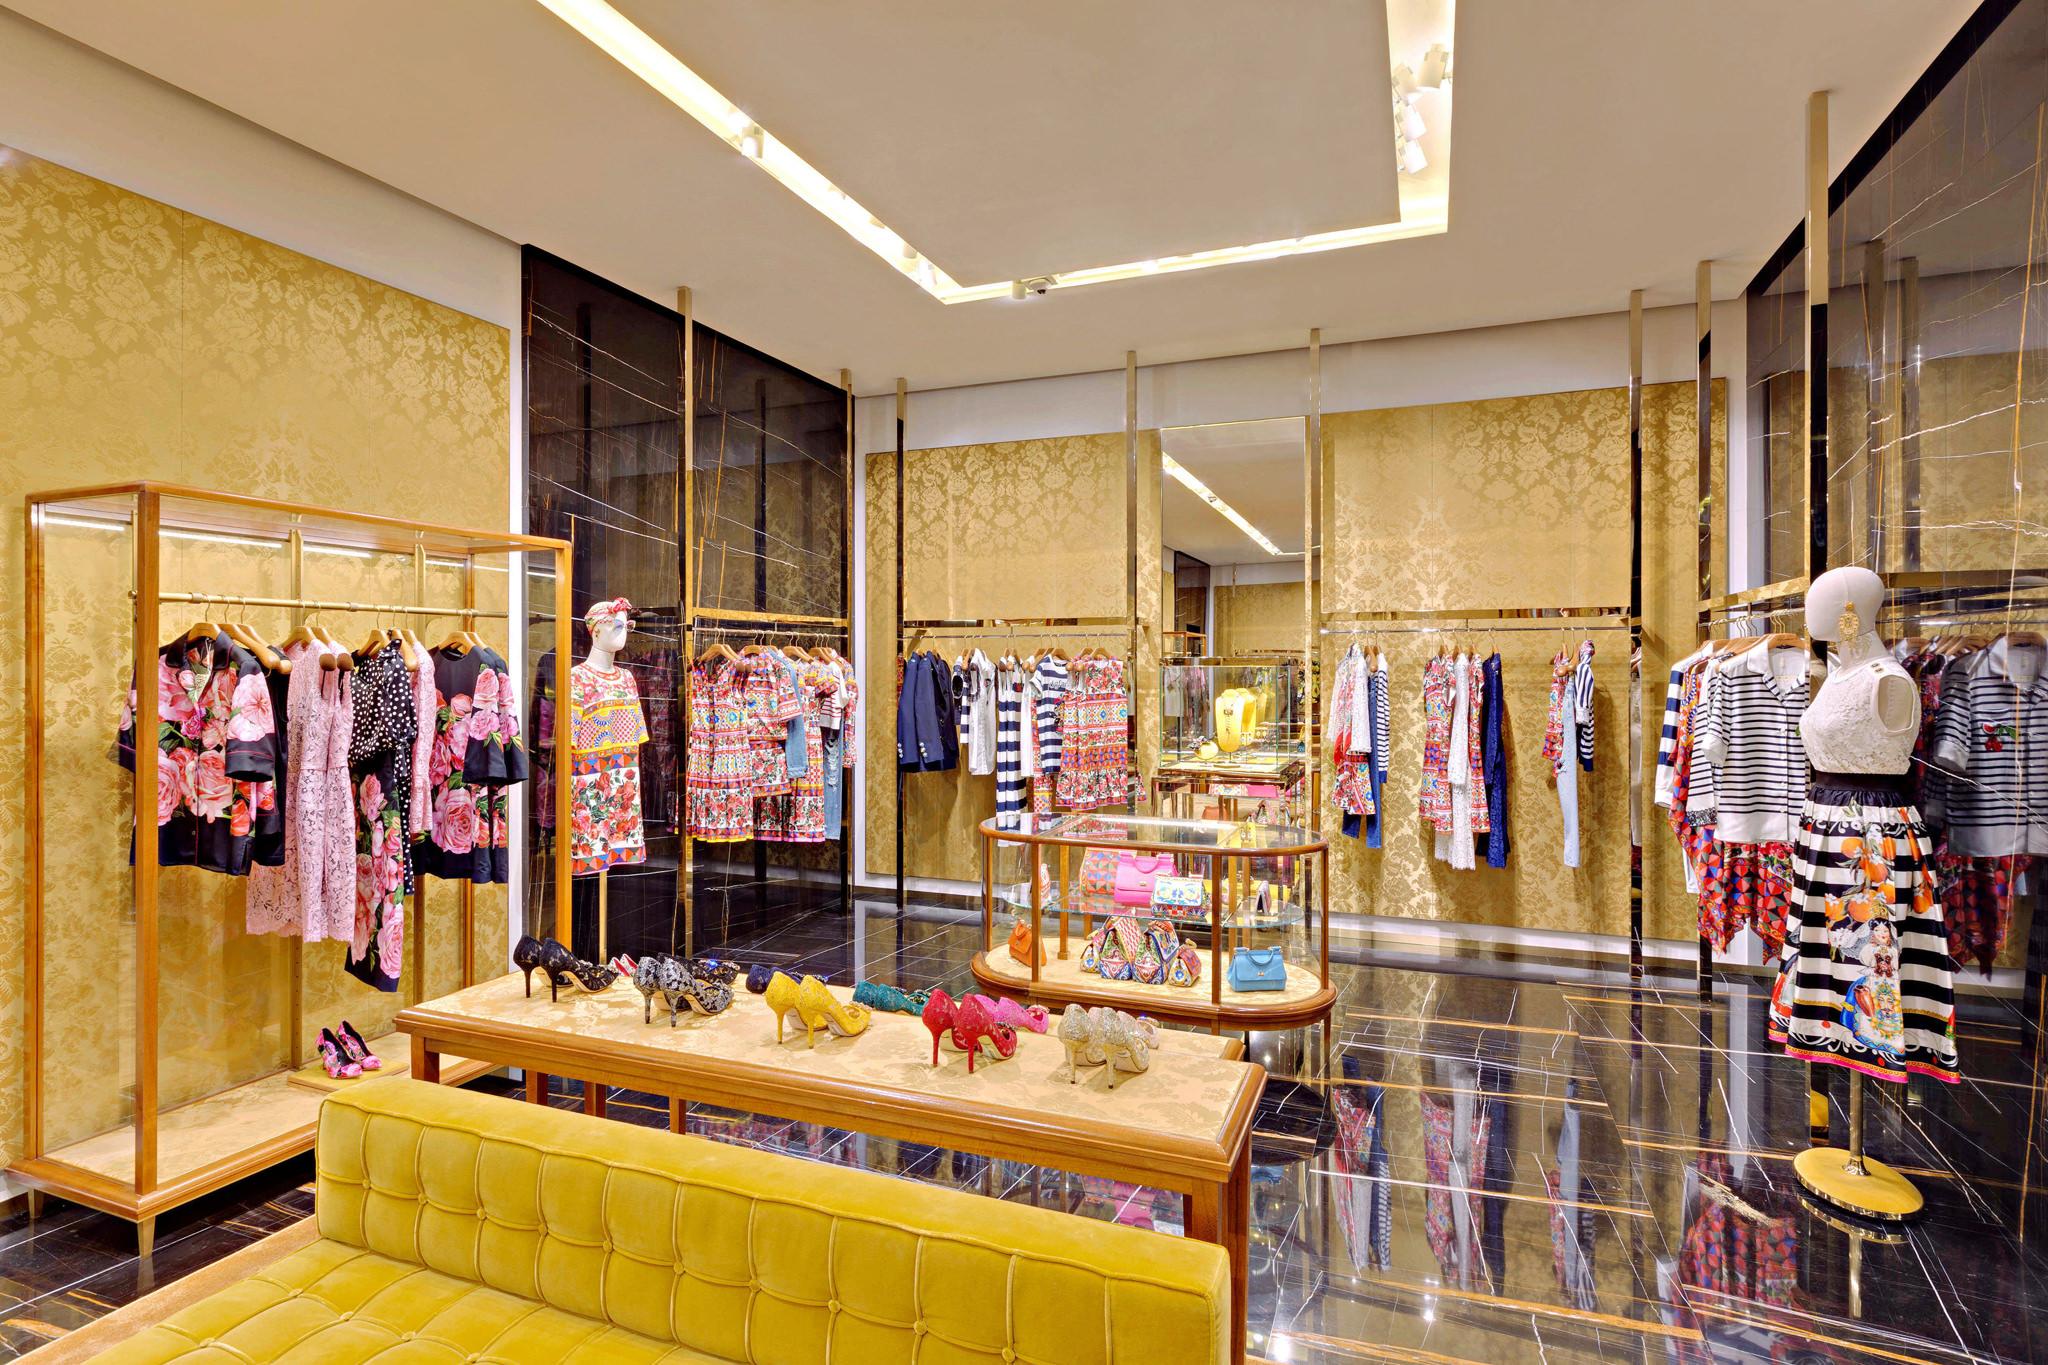 20170519 - Dolce & Gabbana - HCM - Commercial - Interior - Store - Retouch 0003.jpg